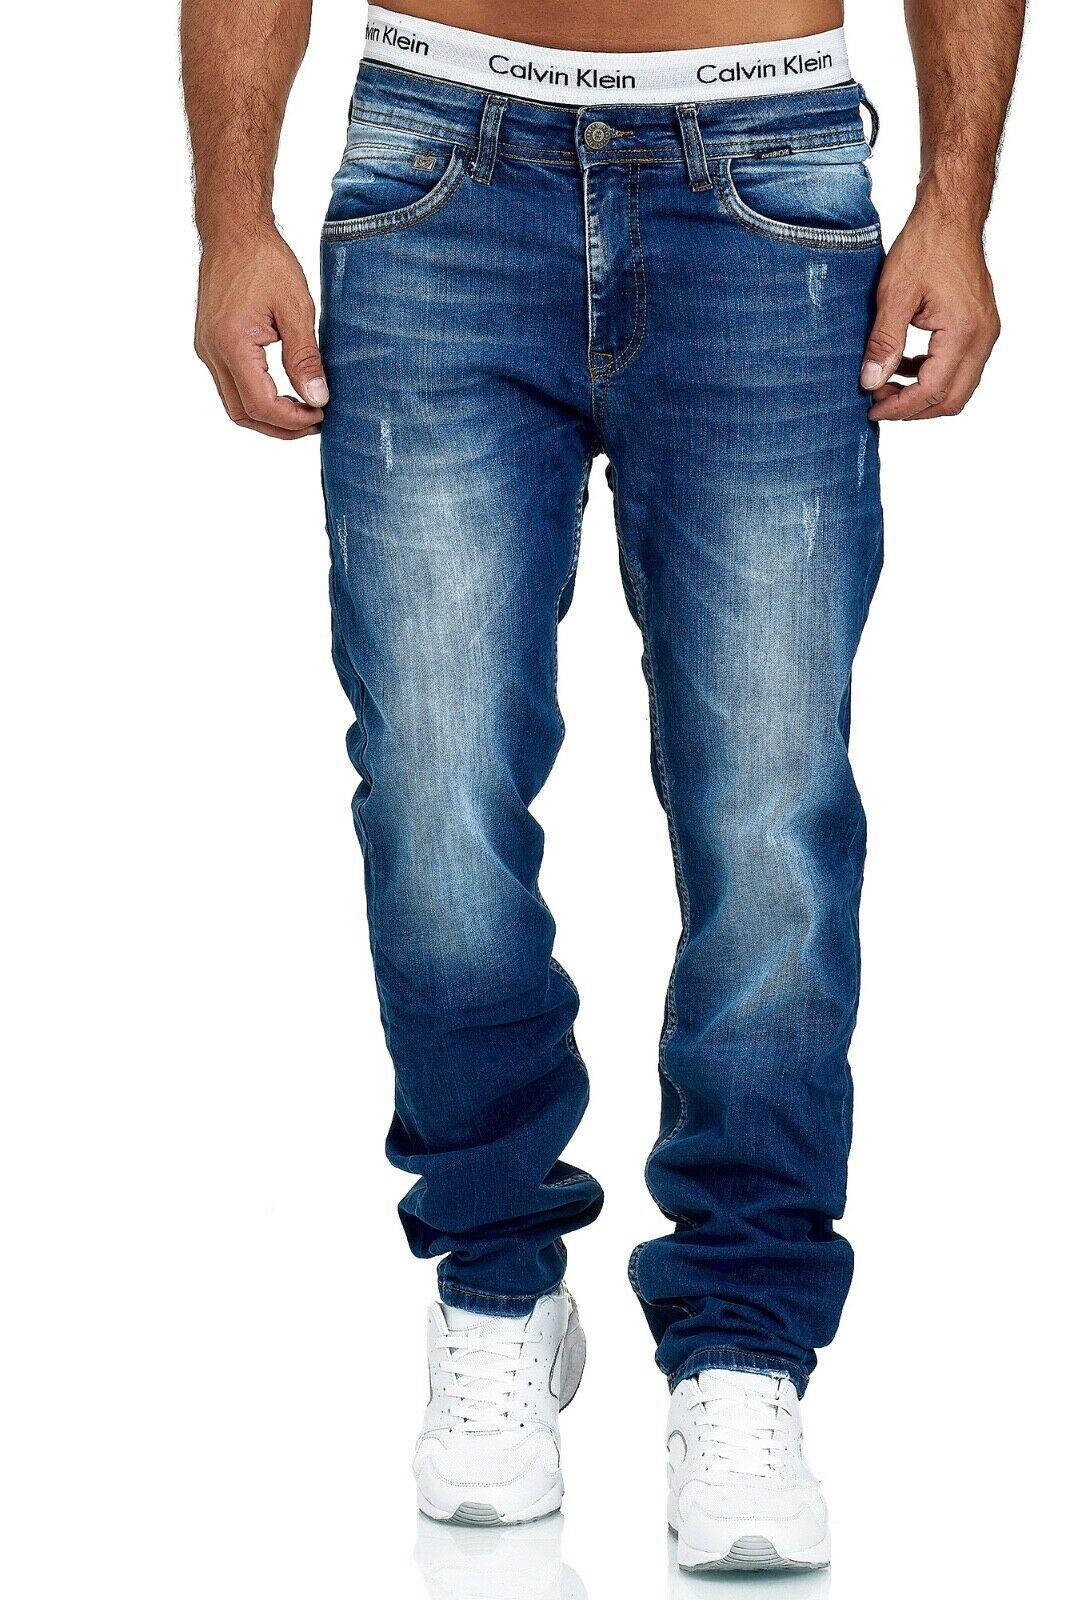 Herren-Jeans-Hose-Denim-KC-Black-Washed-Straight-Cut-Regular-Dicke-Naht-naehte Indexbild 36